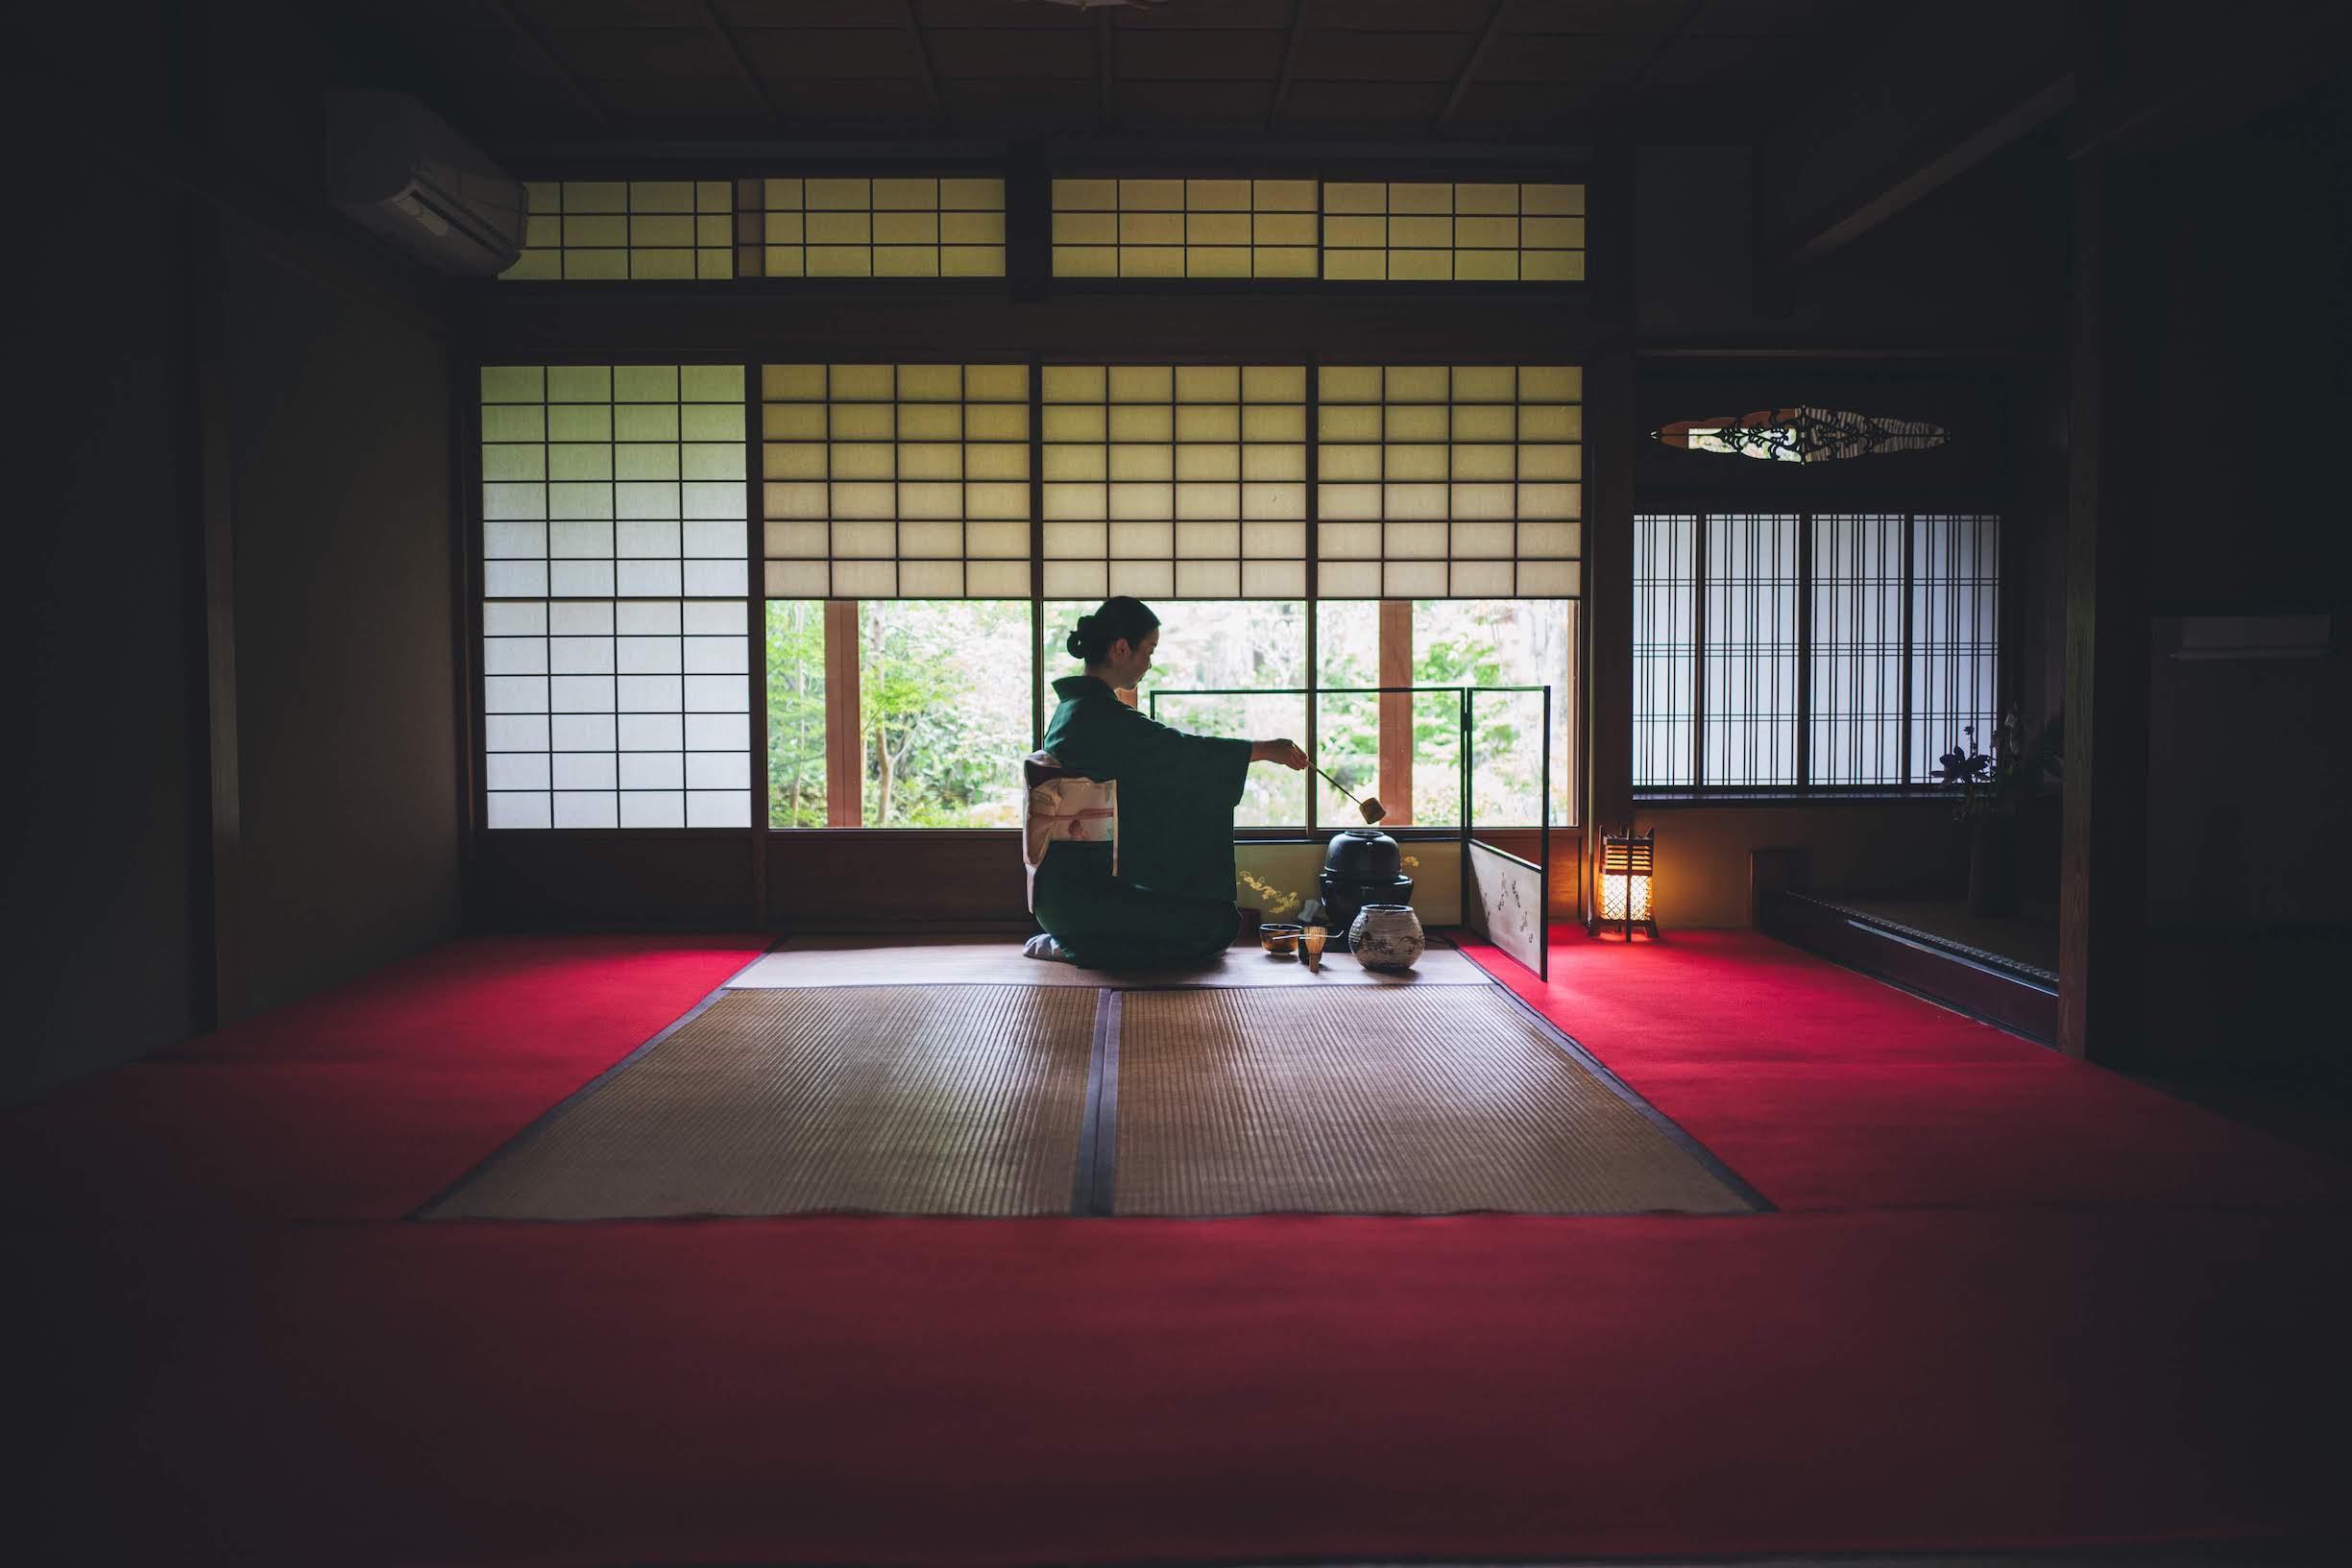 Watch an authentic tea ceremony performance in Camellia GARDEN'S beautiful tearoom.